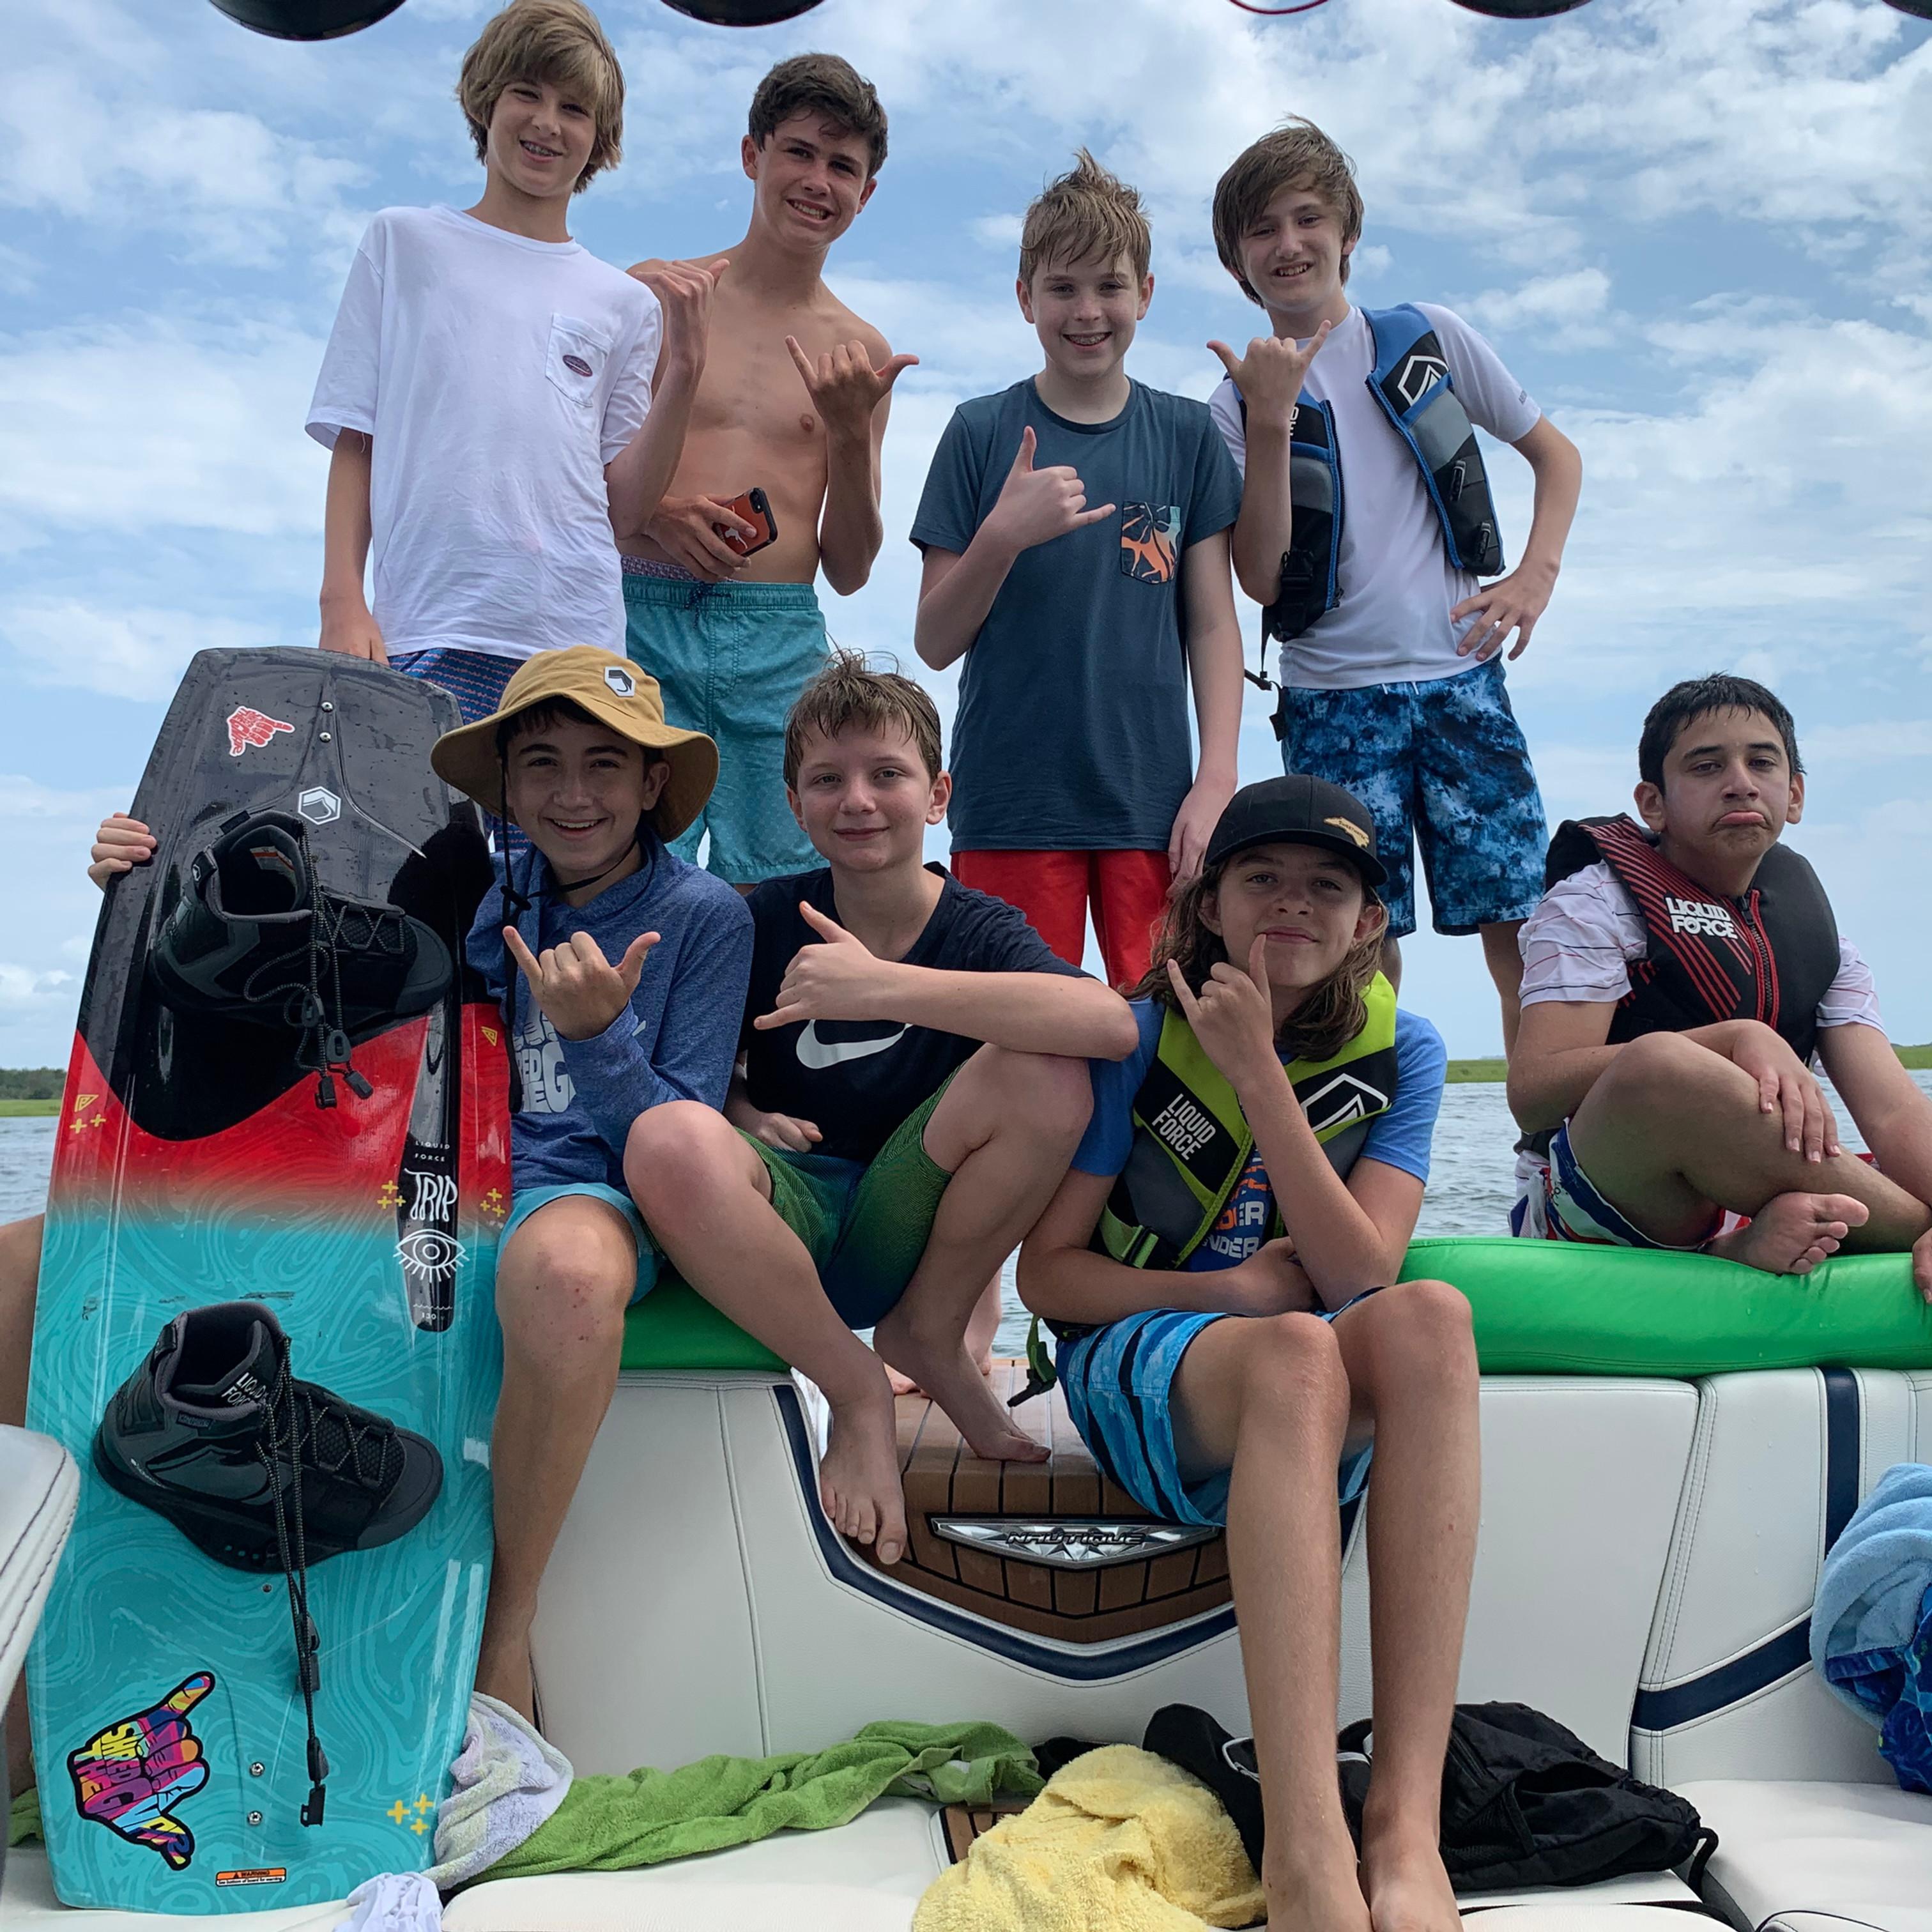 Kids Camp August 16-19